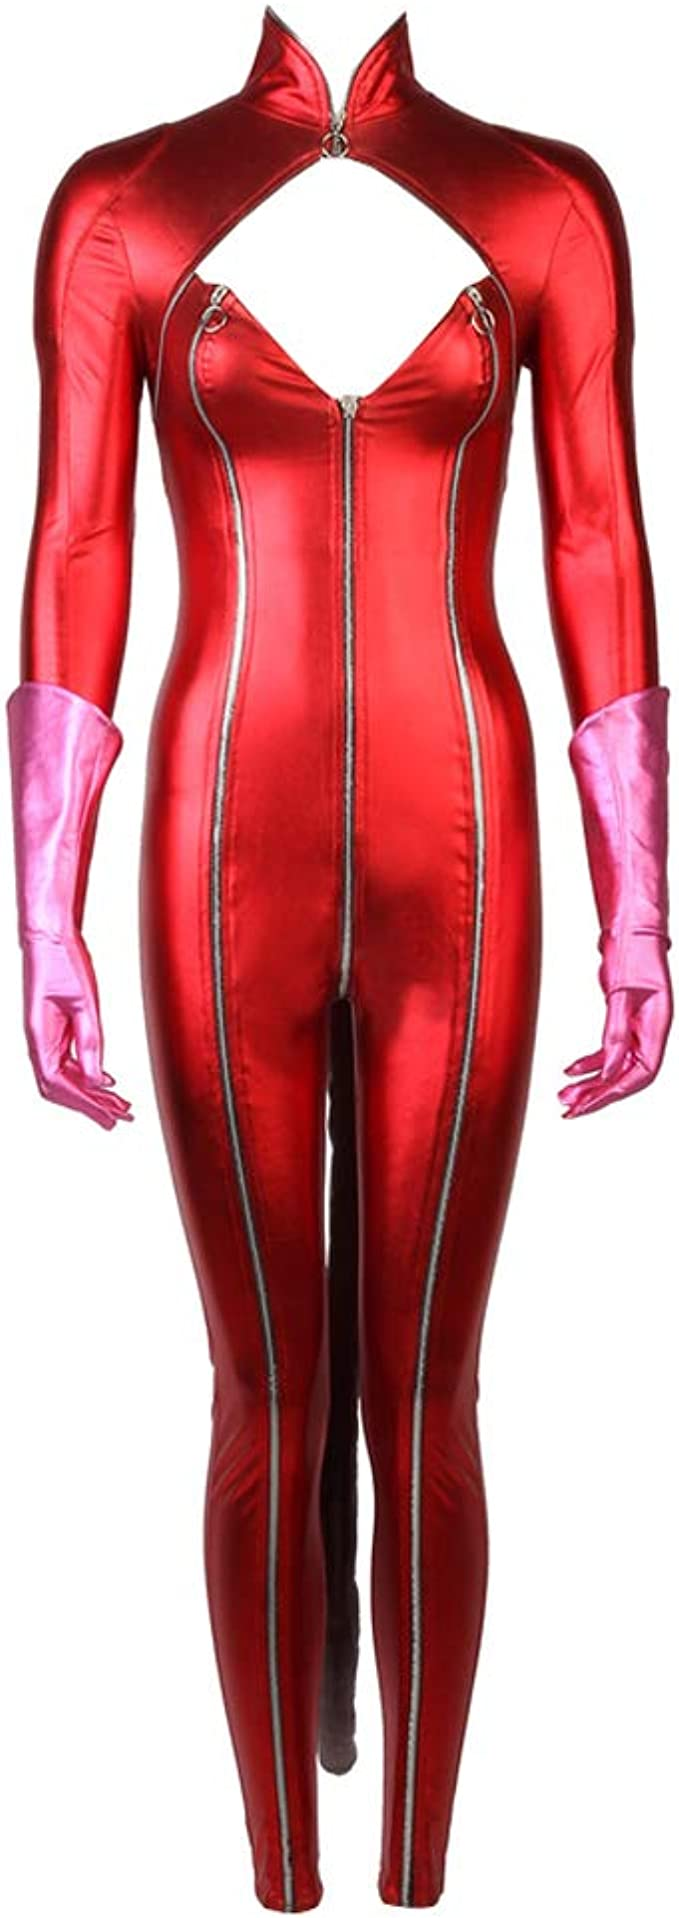 Cosplaybar Persona 5 Anne Takamaki Panther Zentai Bodysuit Boots Cosplay Costume